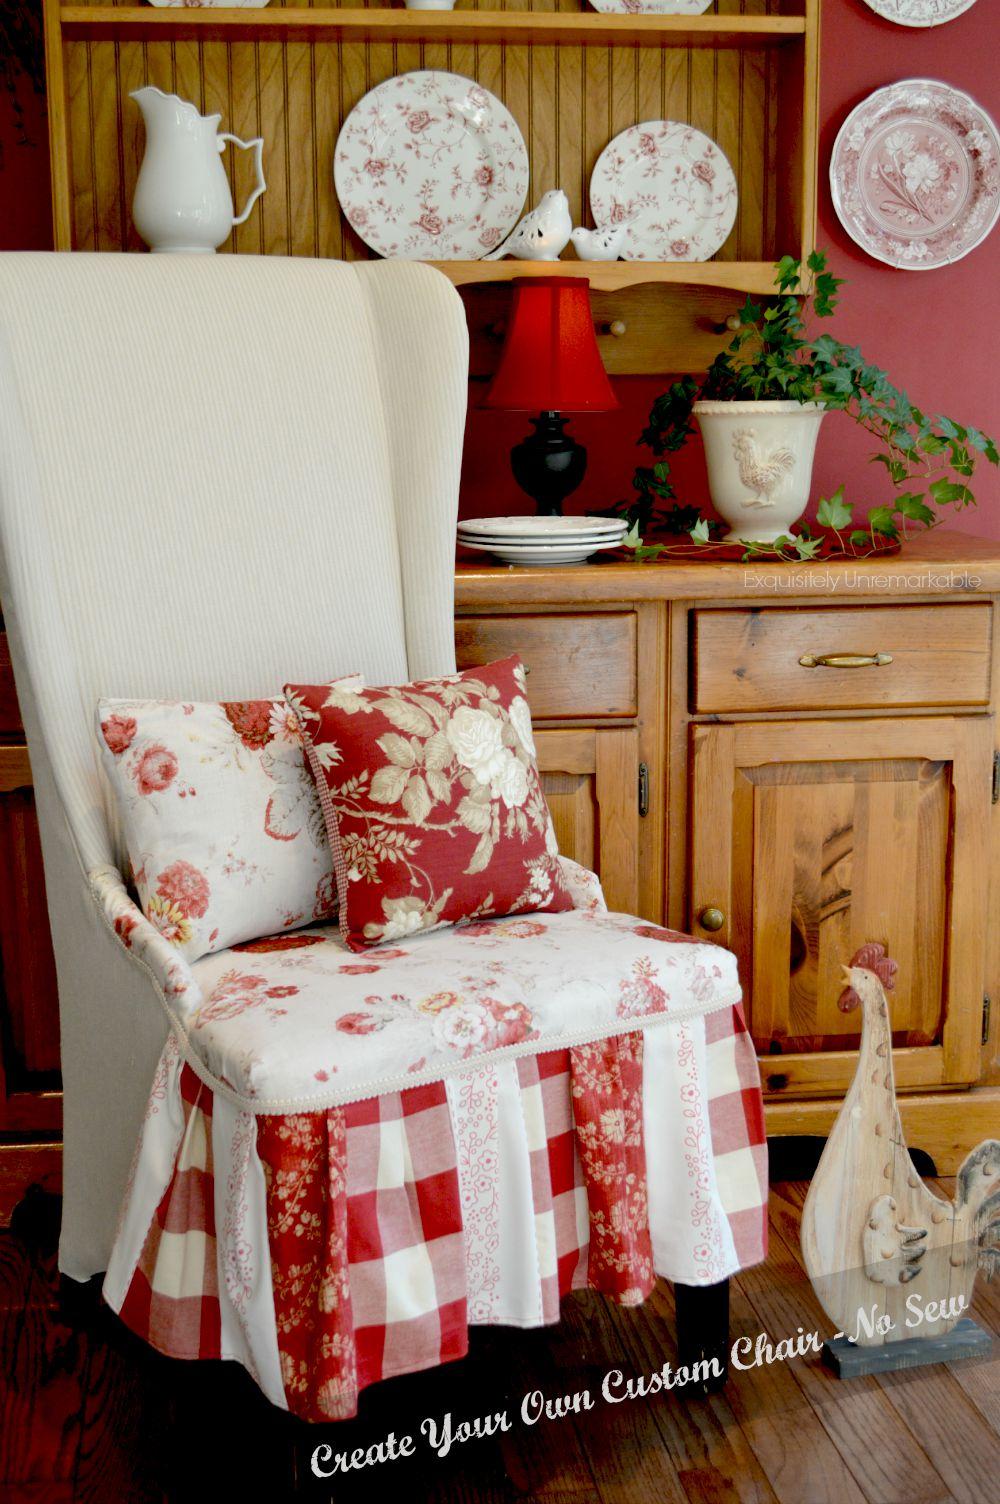 Easy DIY Upholstered Chair